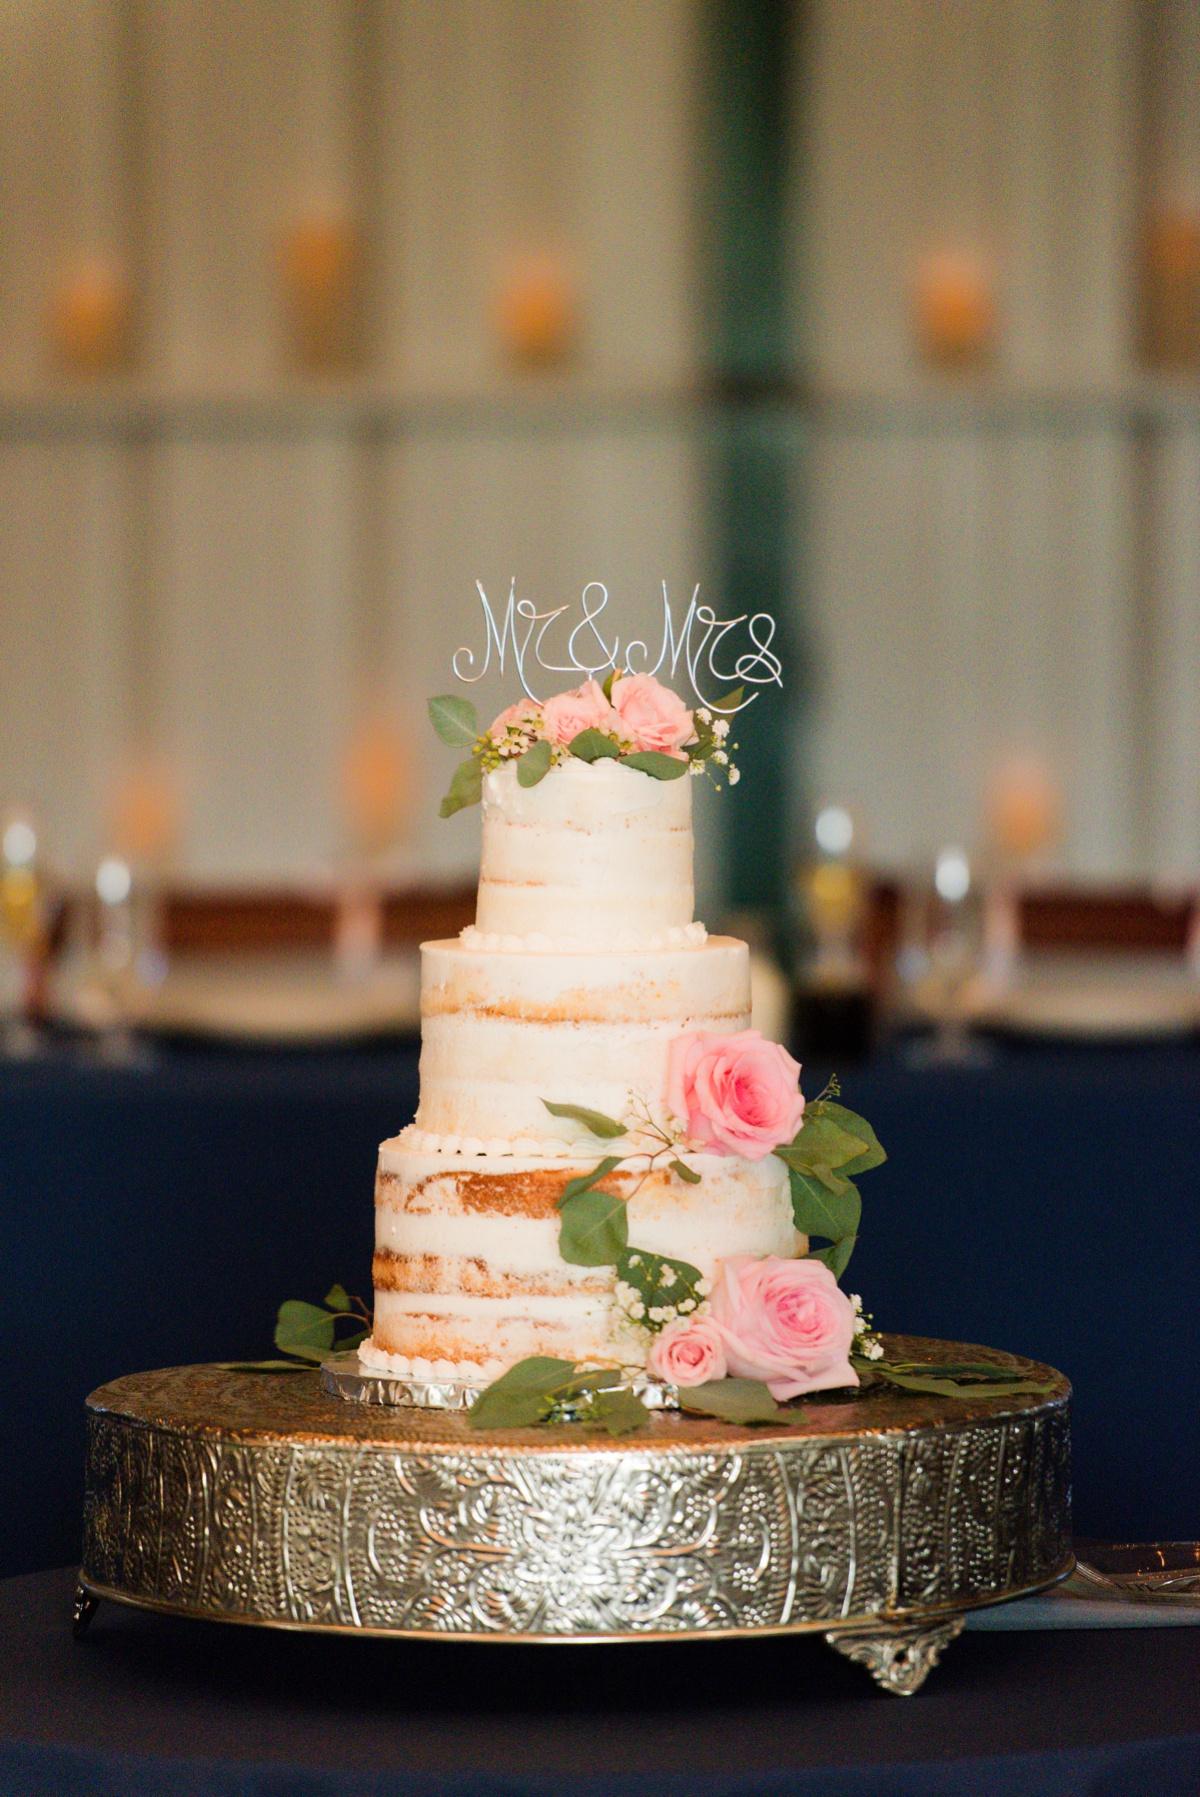 Whimsical Barn Wedding at Destiny Hill Farm - Burgh Brides ...